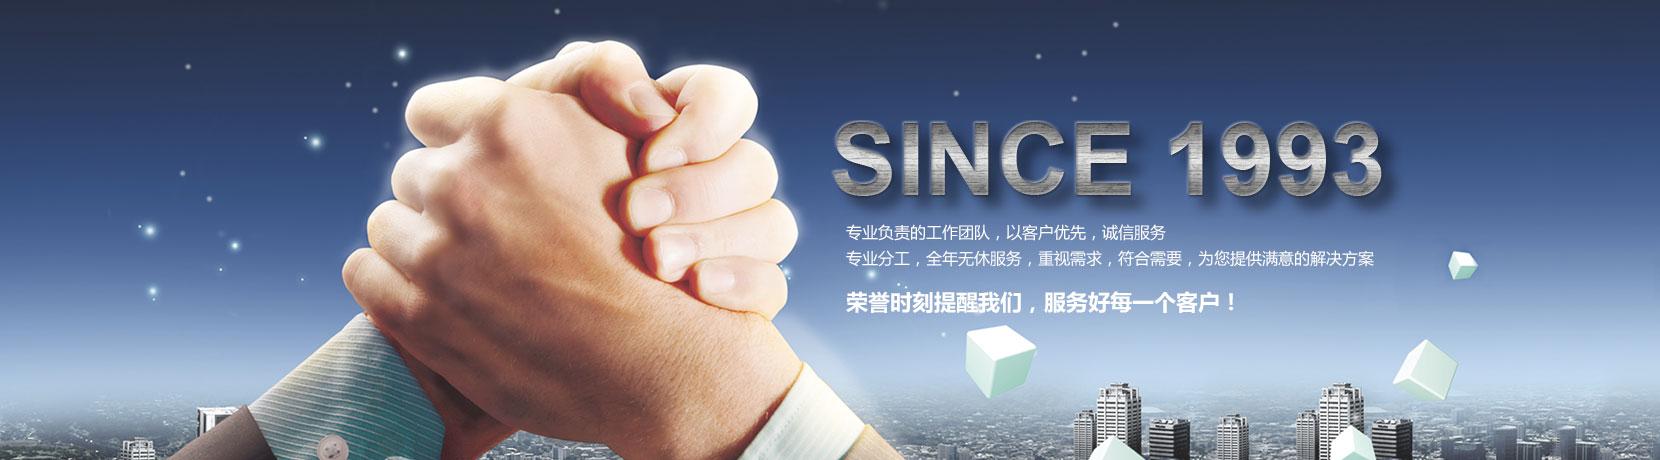 智茂全自动PCB分板机厂家网站首页banner5